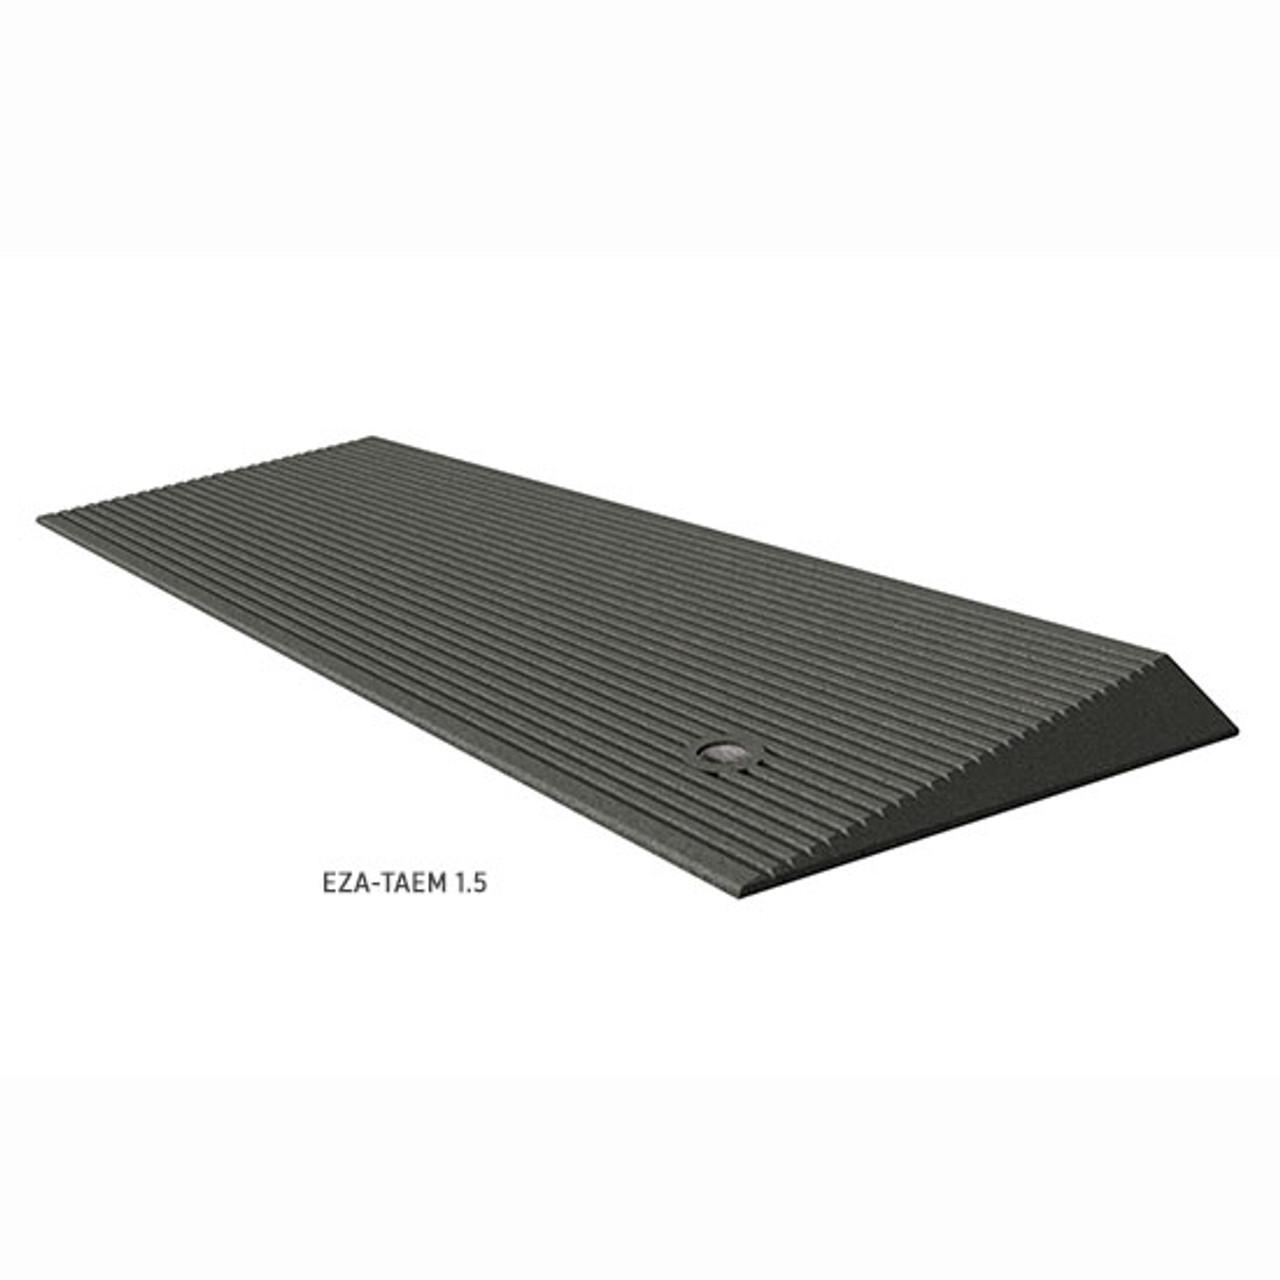 EZA-TAEM-1.5   1.5 inches high